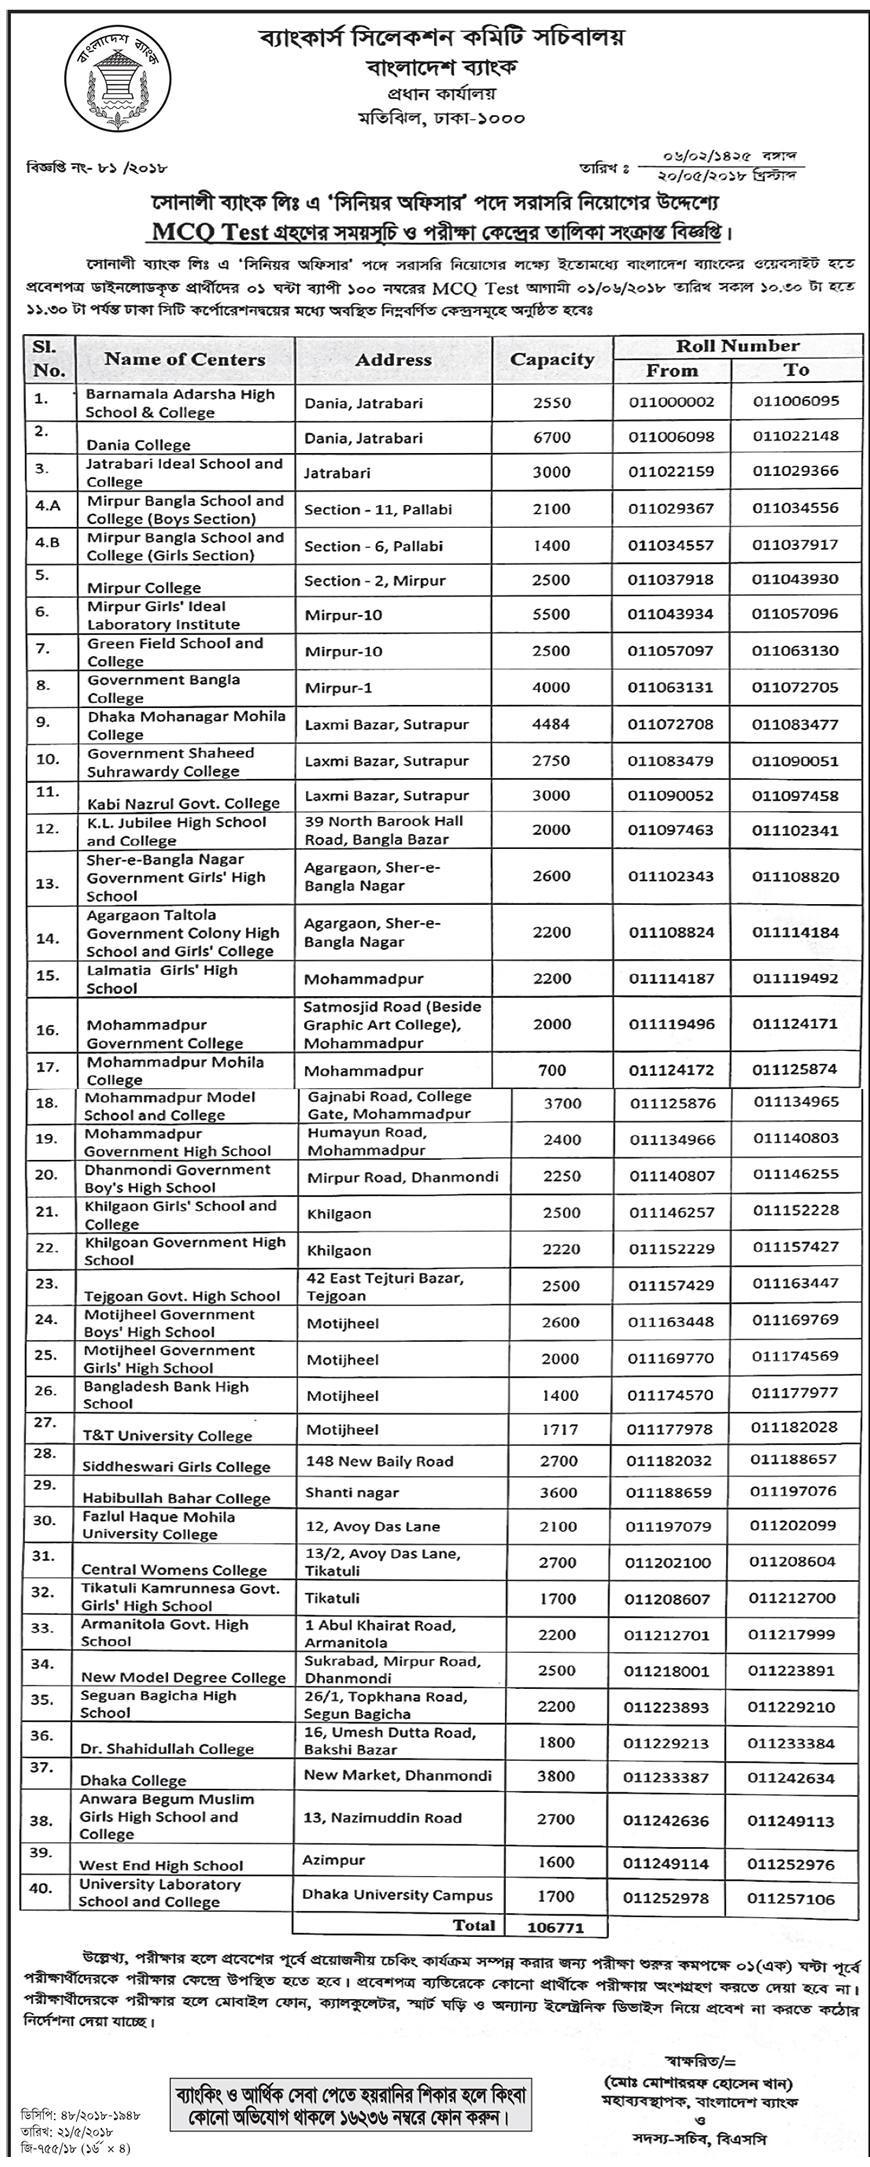 Sonali Bank Exam Schedule & Admit Card Download Notice 2018